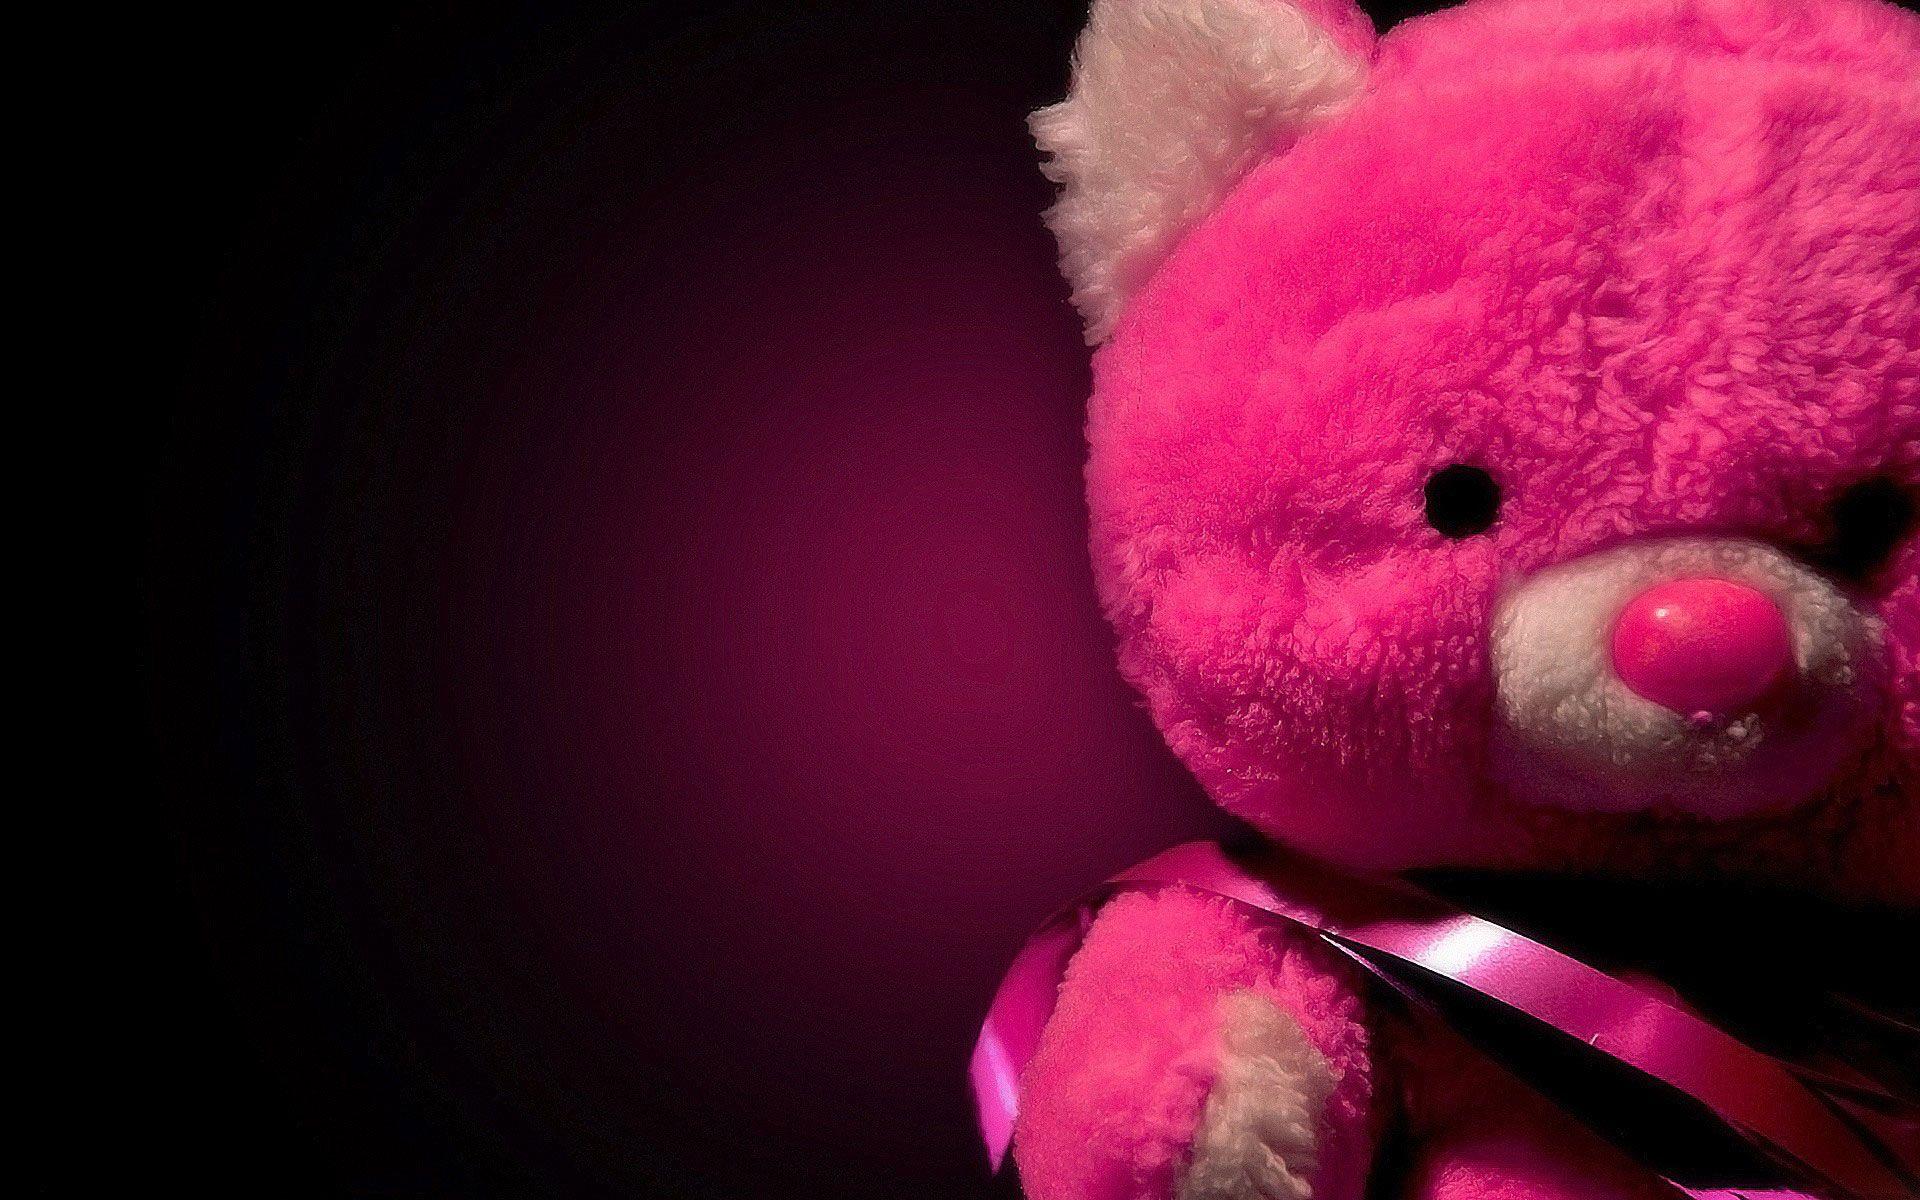 Pink Teddy Bear Hd Love Wallpaper Teddy Bear Wallpaper Teddy Bear Pictures Teddy Bear Images